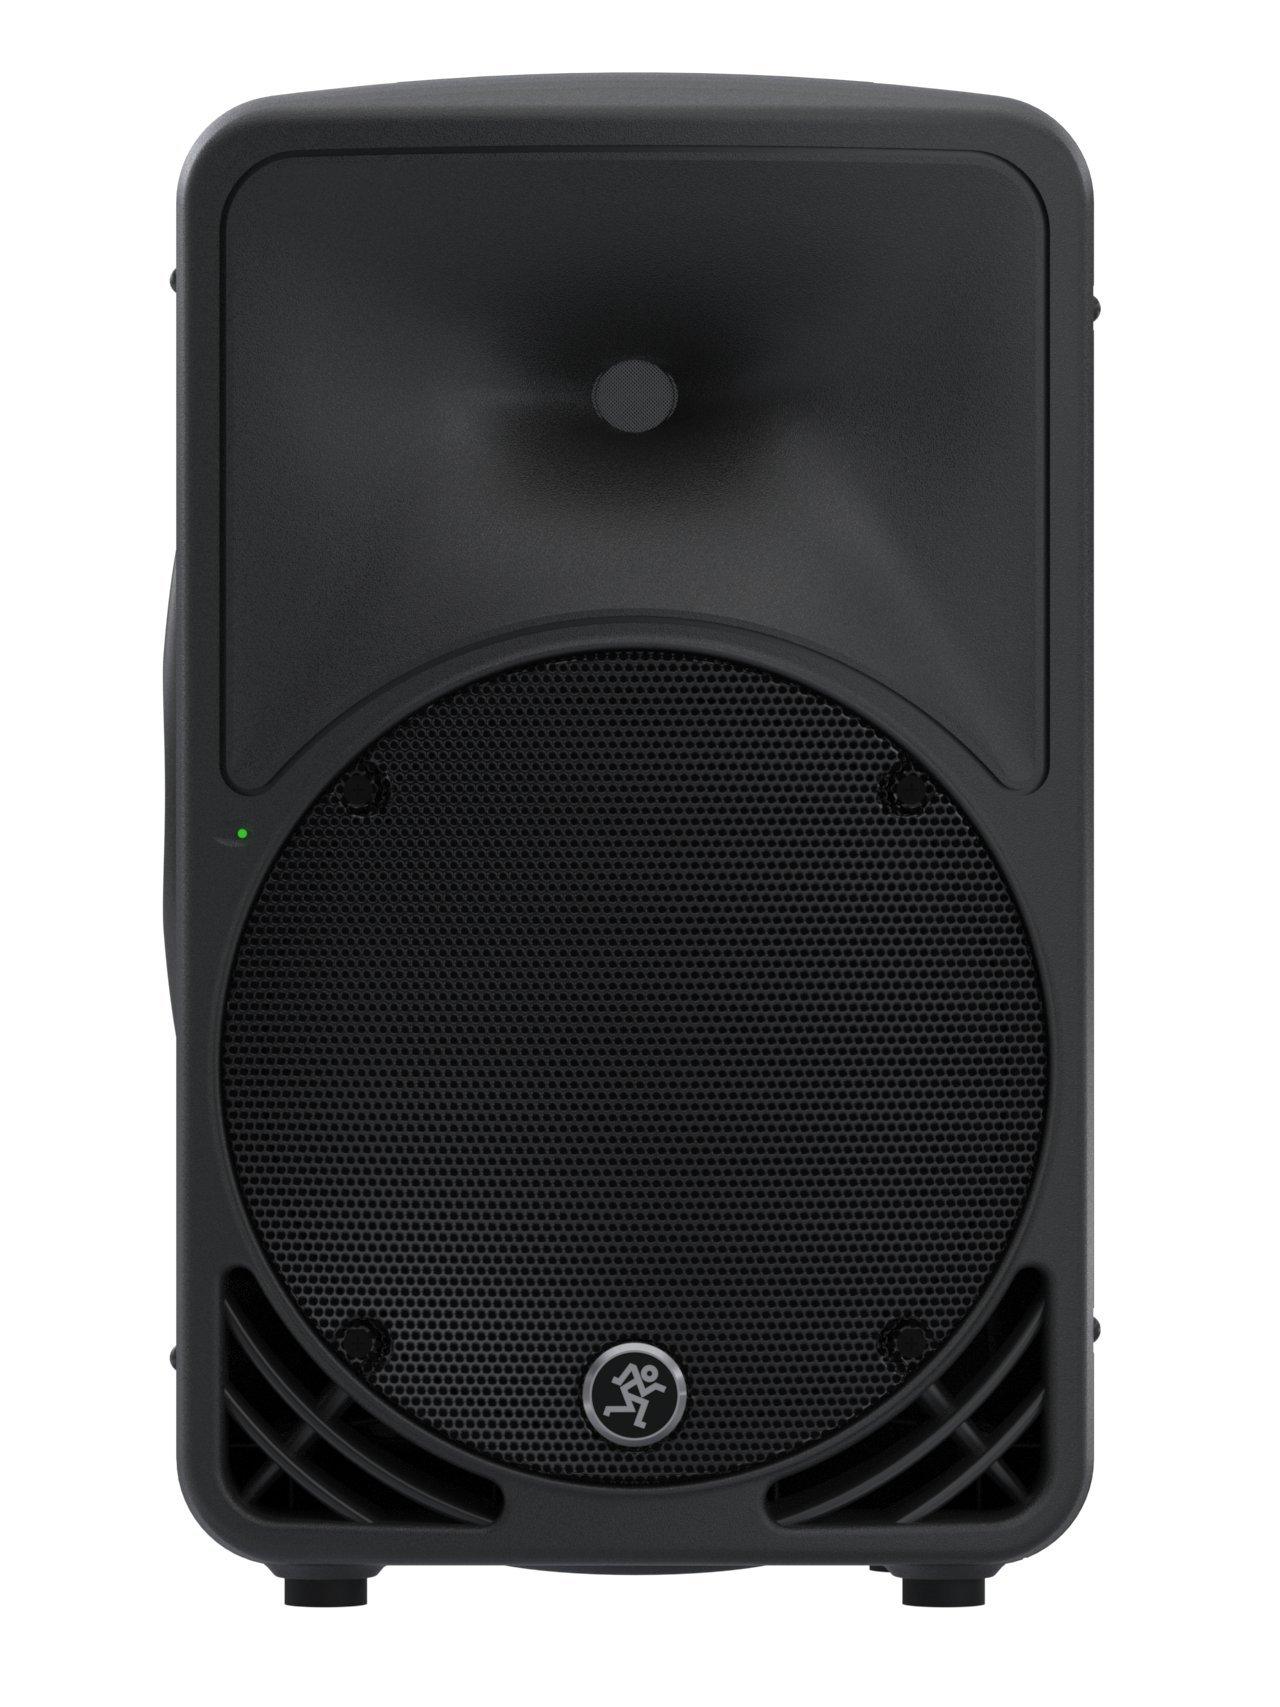 Mackie SRM350v3 1000 Watts High-Definition Portable Powered Loudspeaker